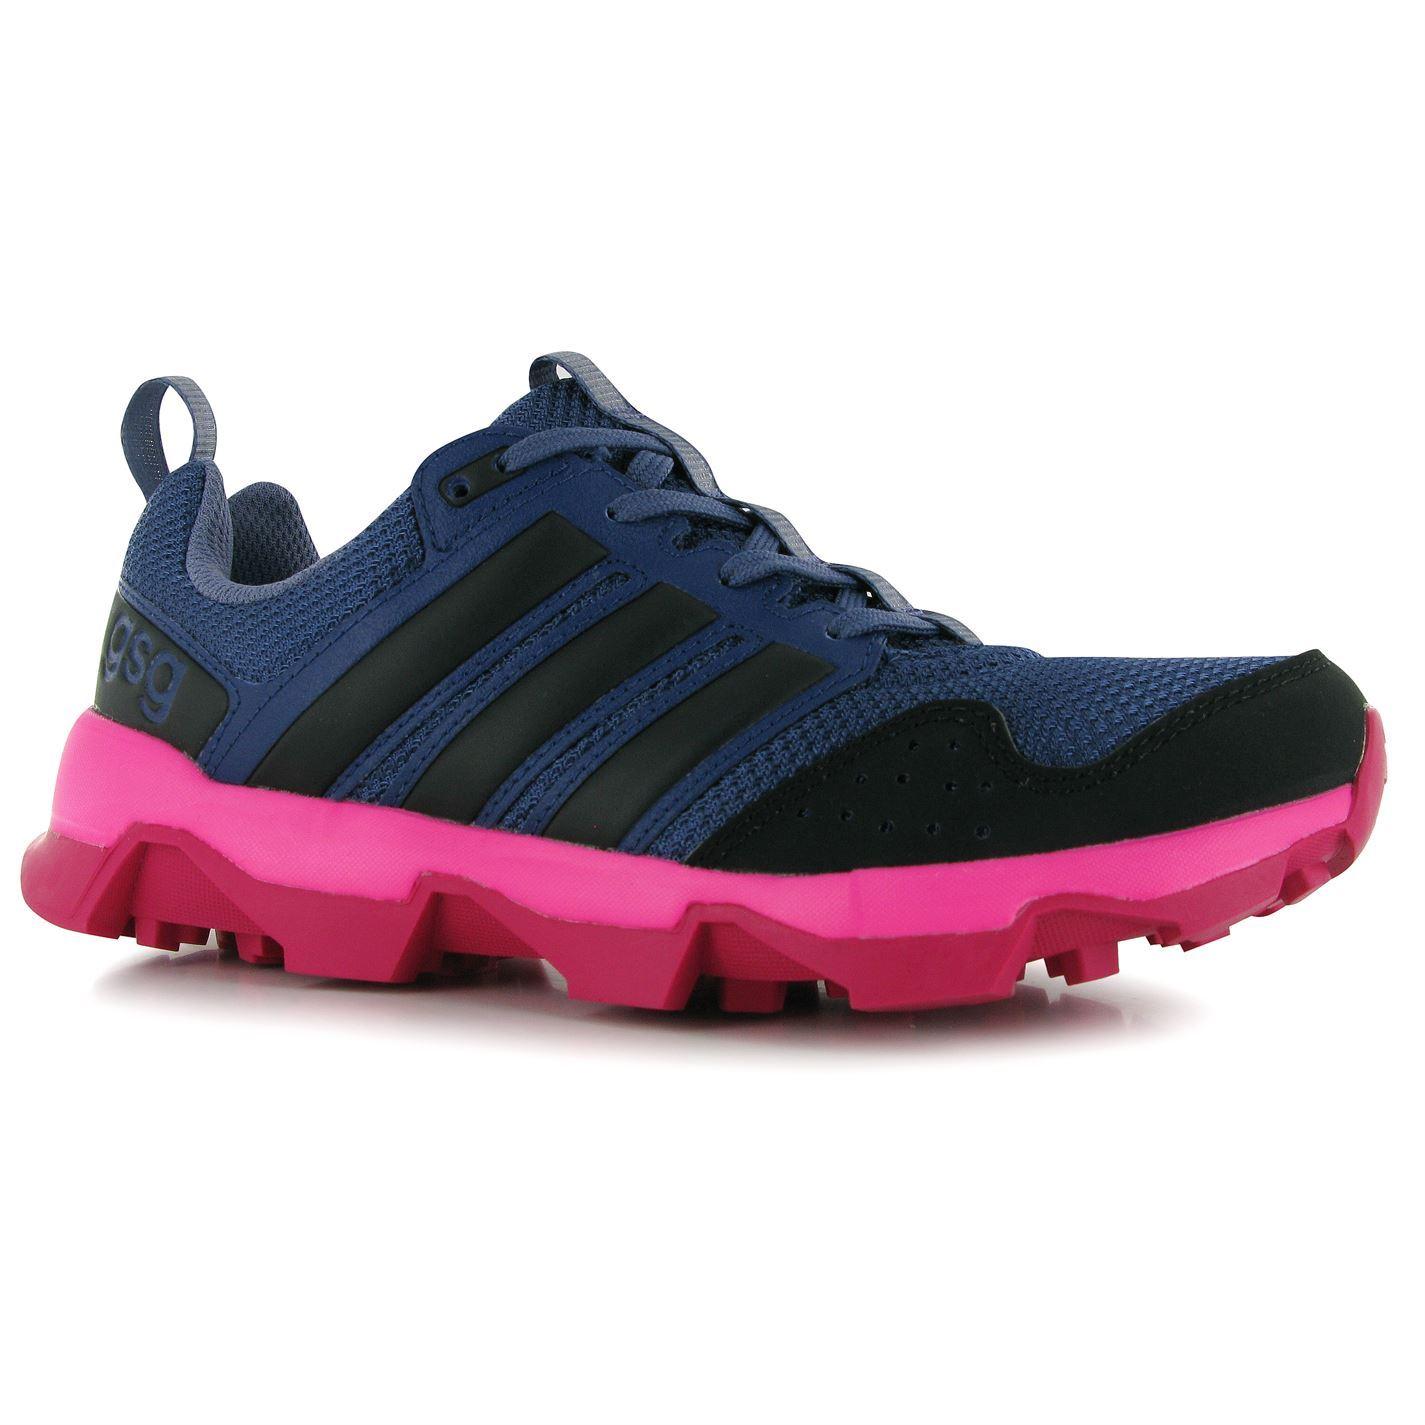 Adidas Run Strong Shoes For Women Adidas Zwart En Oranje